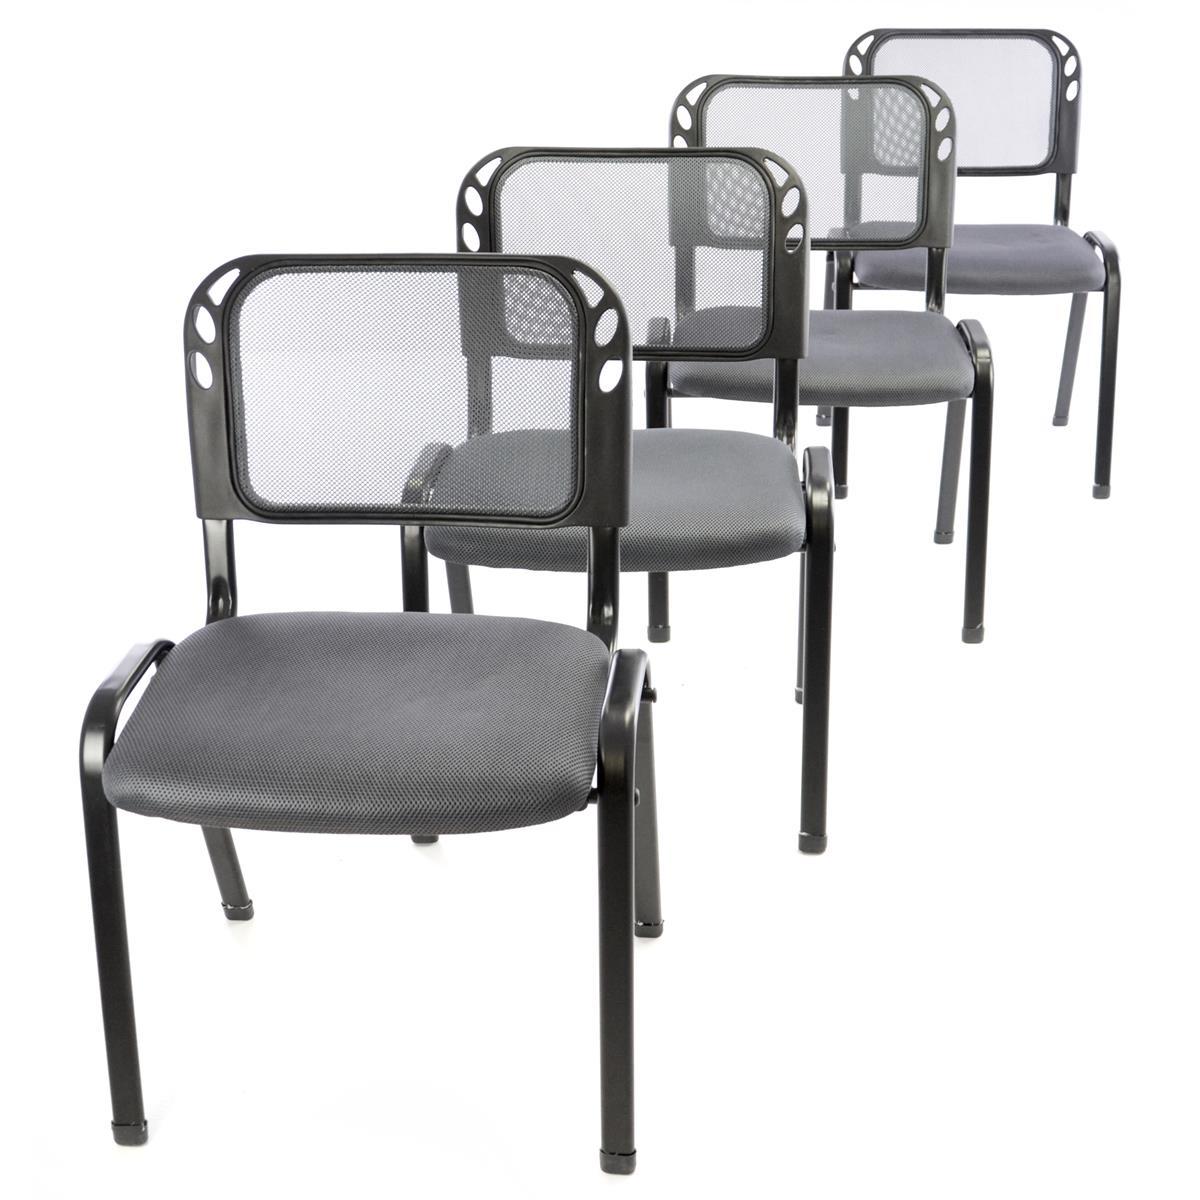 Besucherstuhl 4er Set Bürostuhl Konferenzstuhl Sitzfläche grau gepolstert